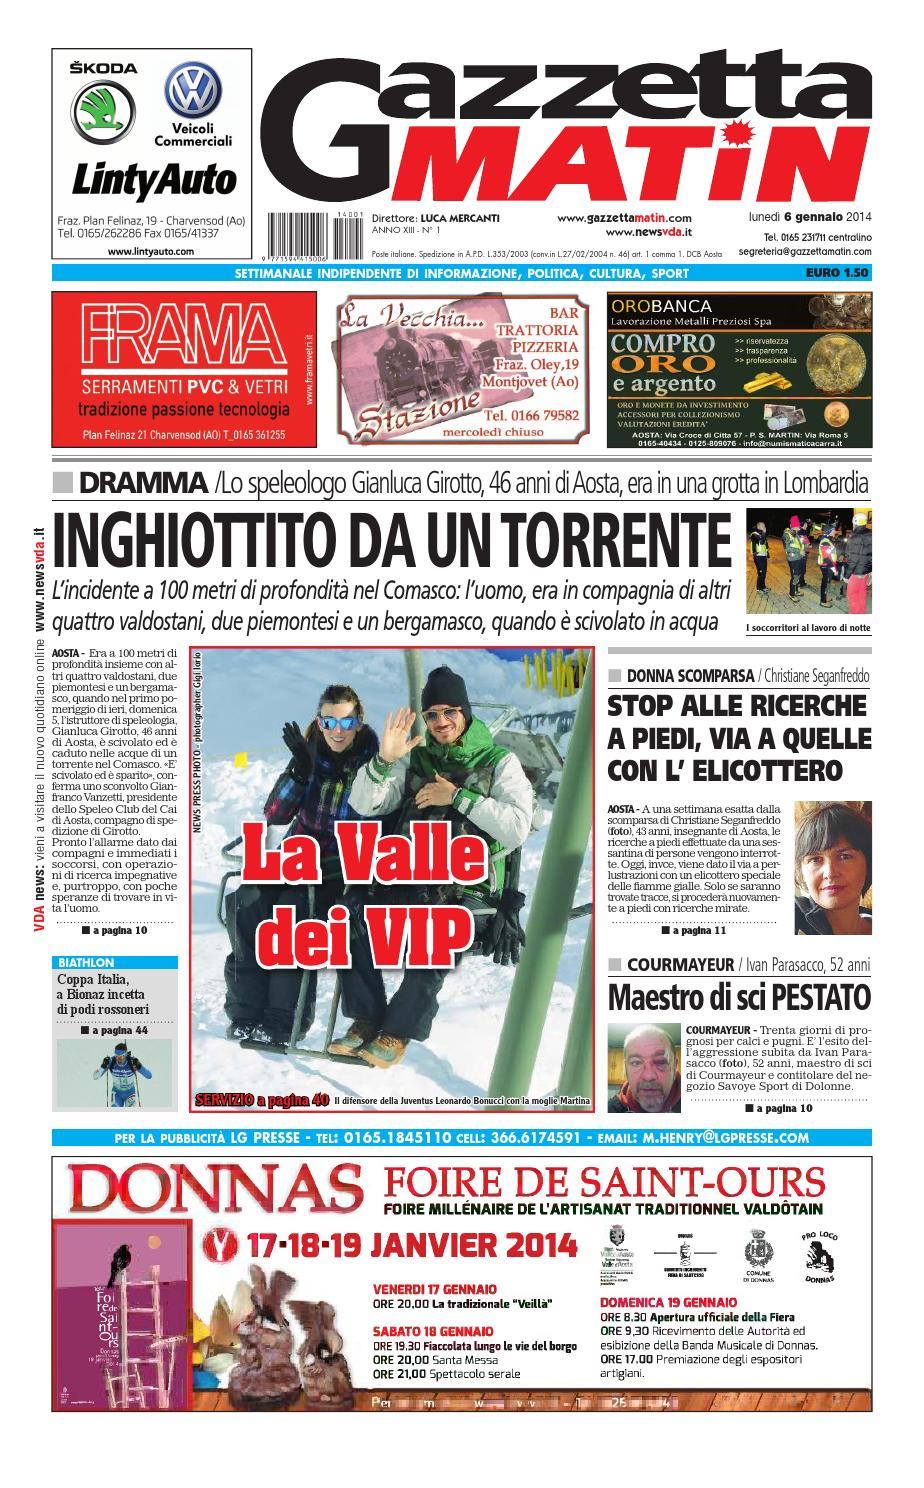 Listino Prezzi Mobili Grange.Gazzetta Matin Del 6 Gennaio 2014 By Luca Mercanti Issuu